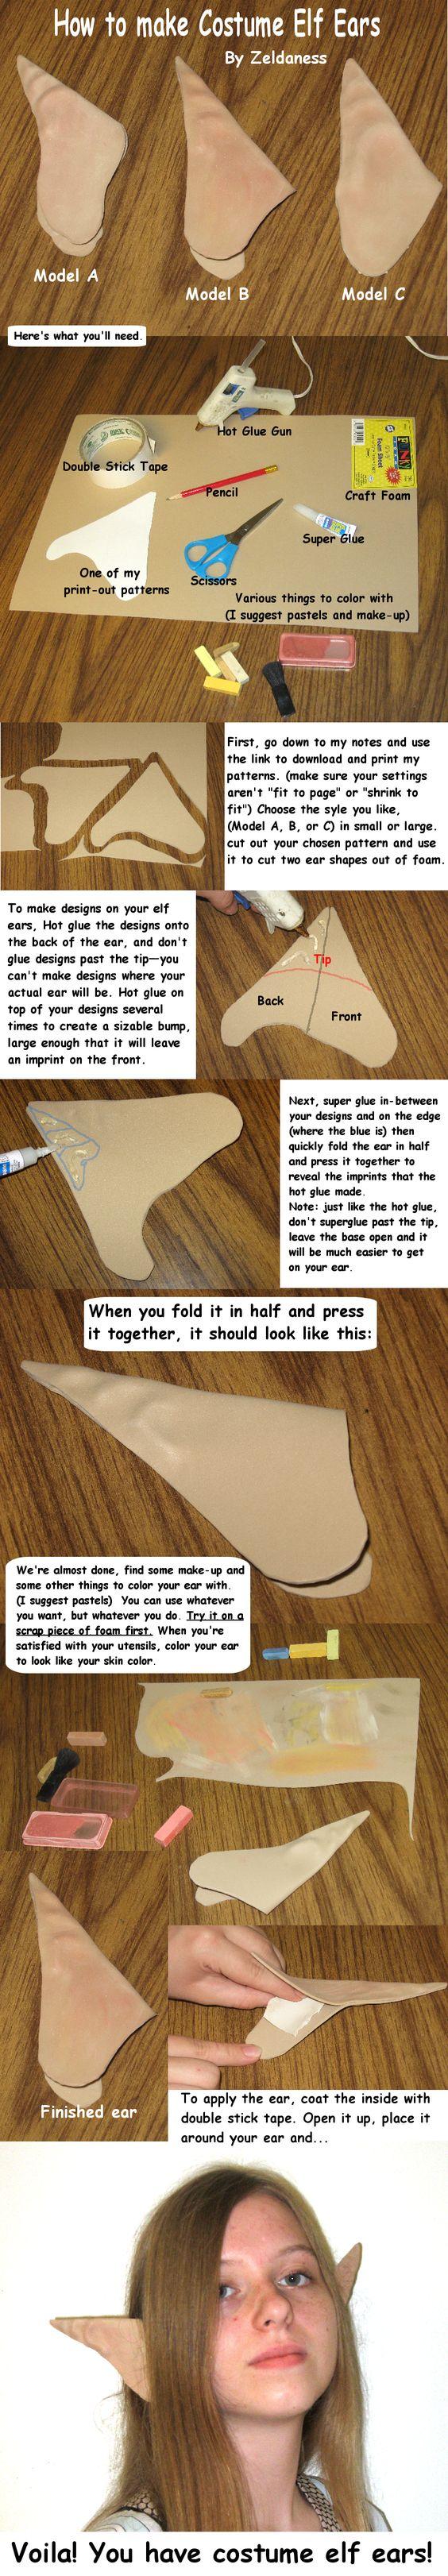 How to Make Costume Elf Ears.